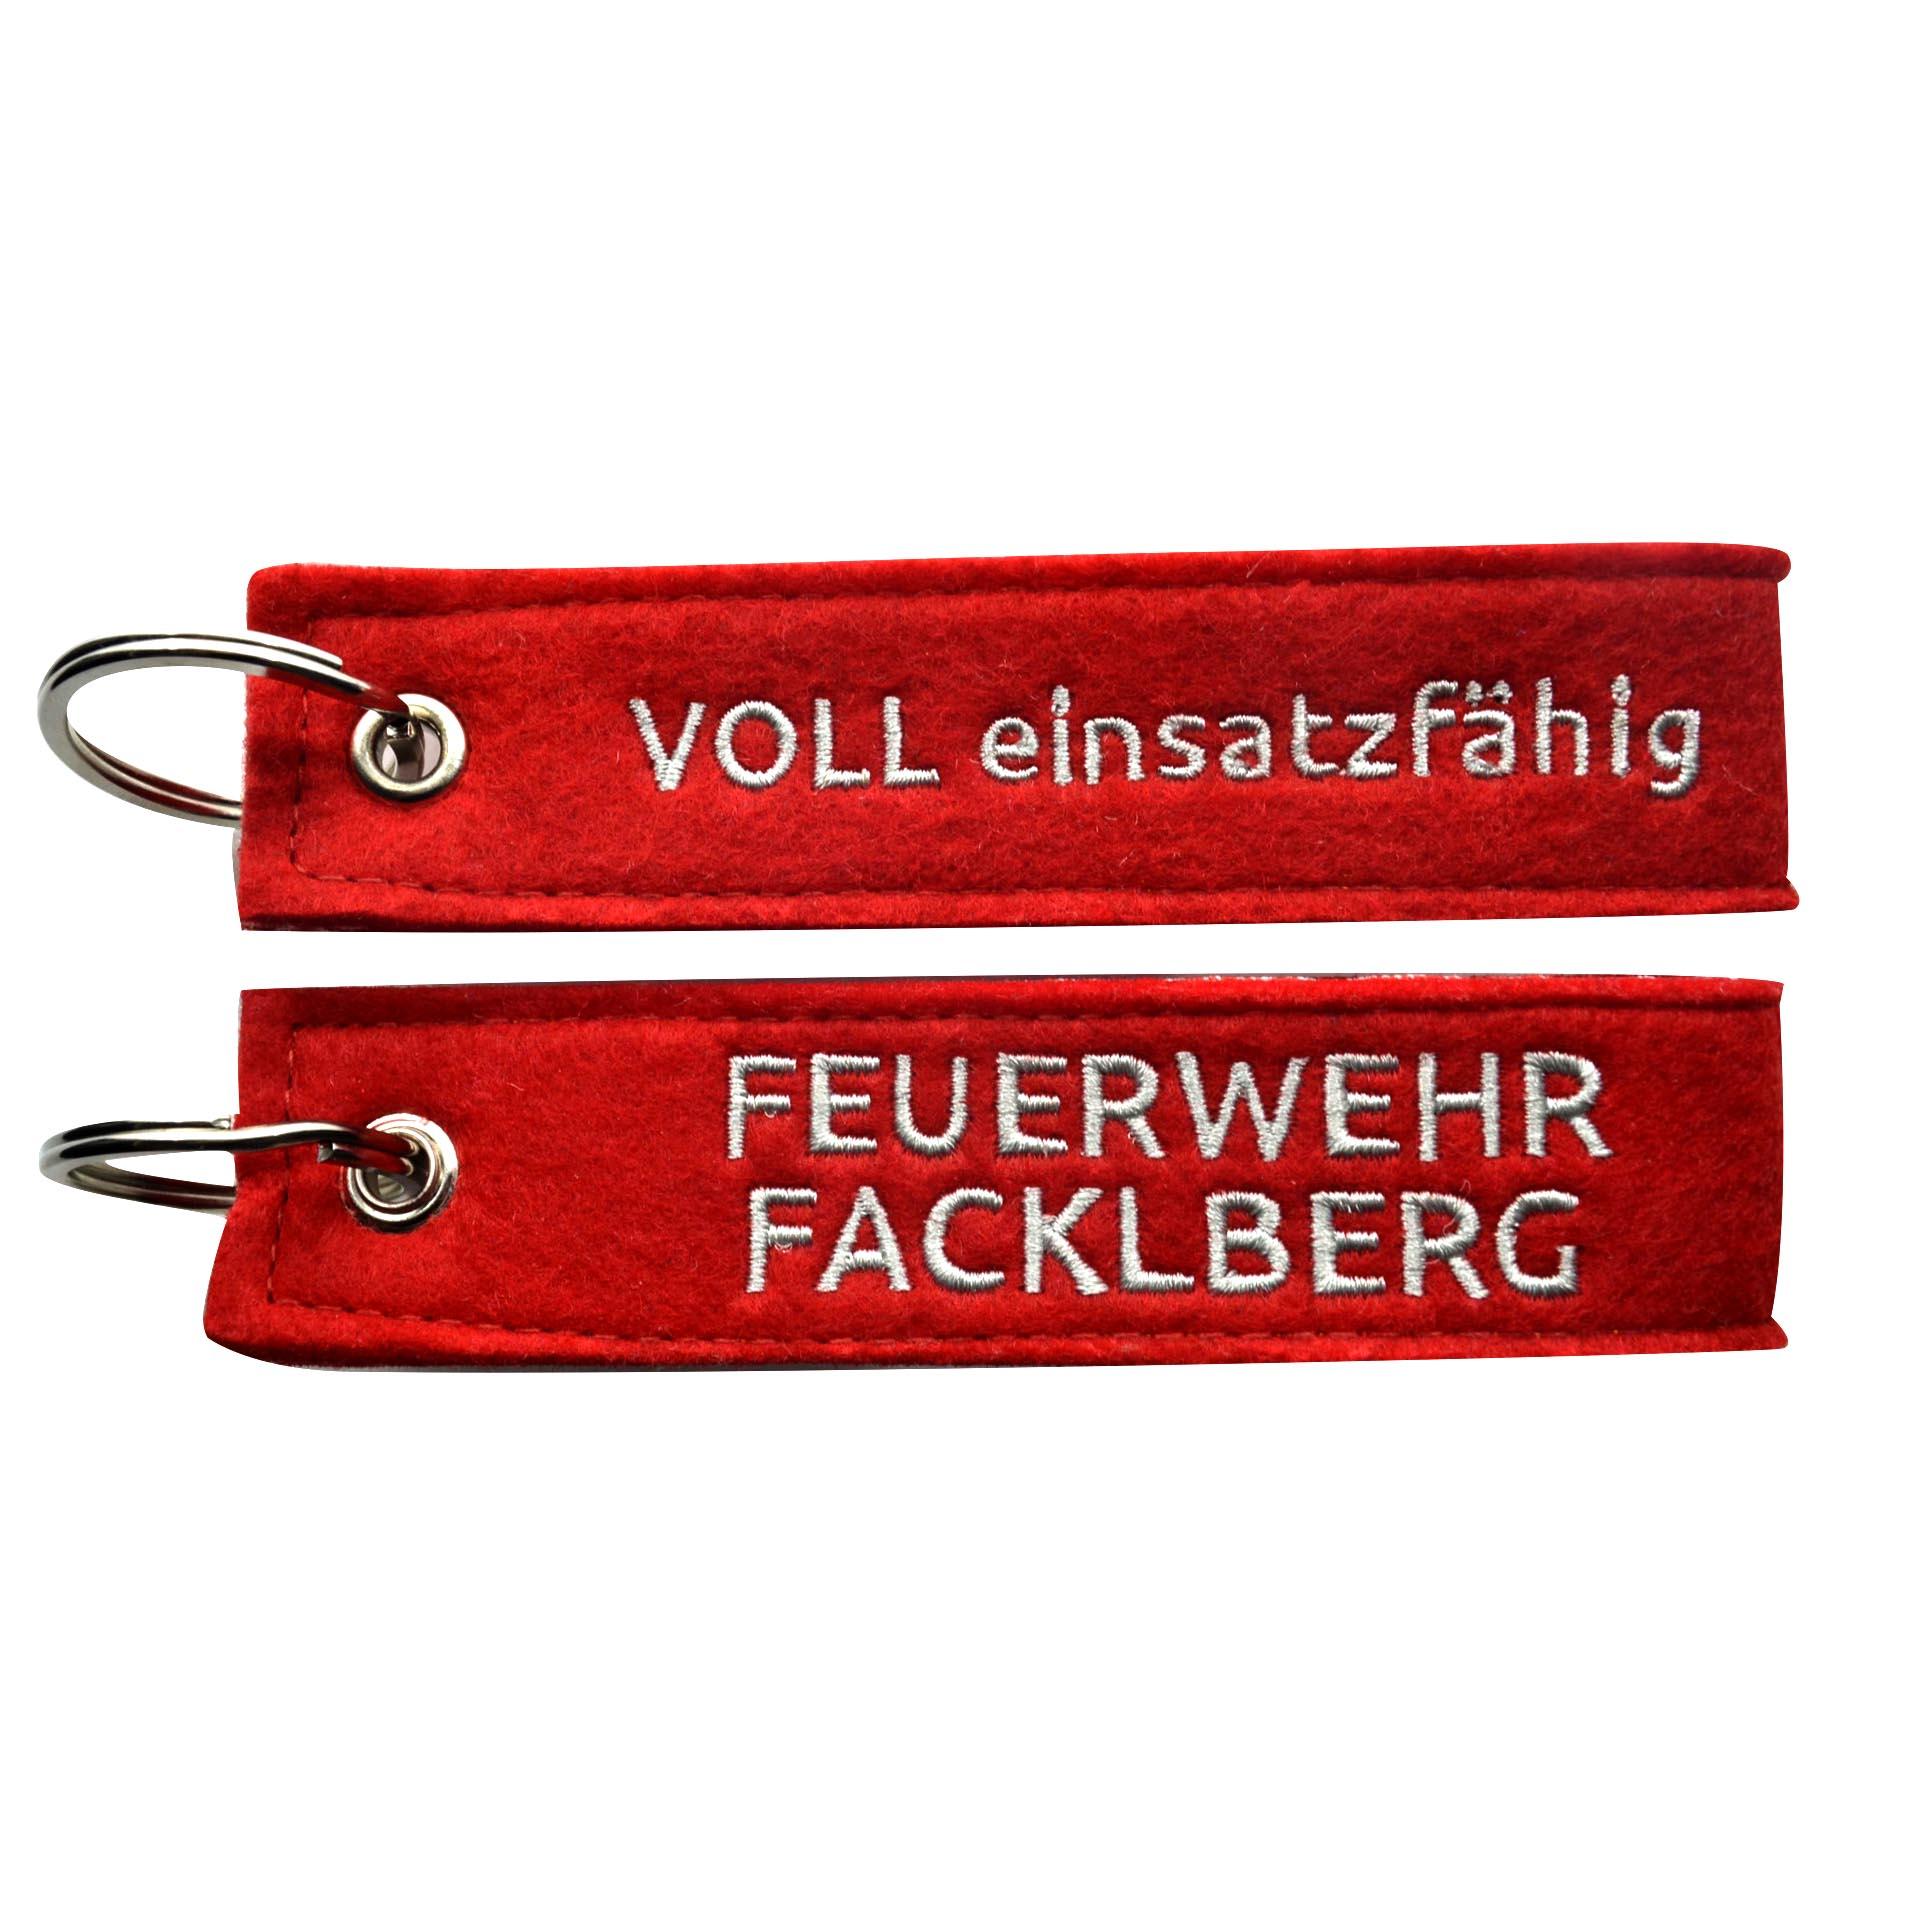 Facklberg